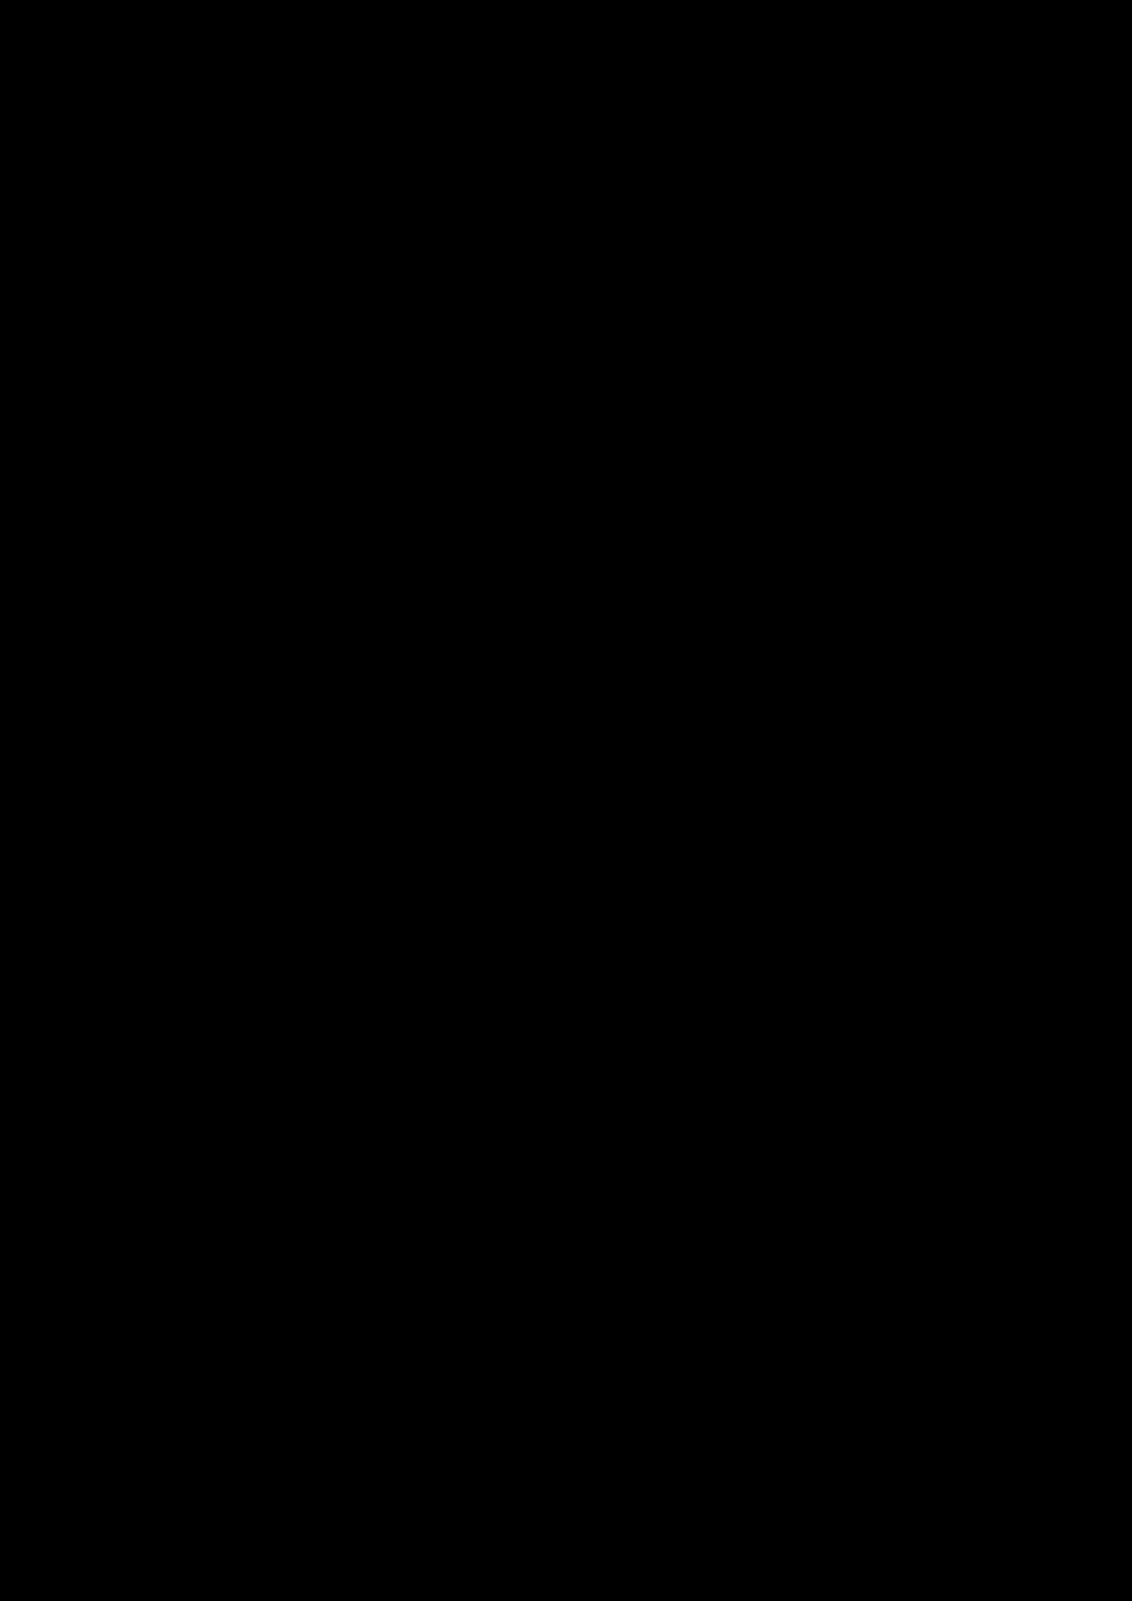 Prosti slide, Image 29